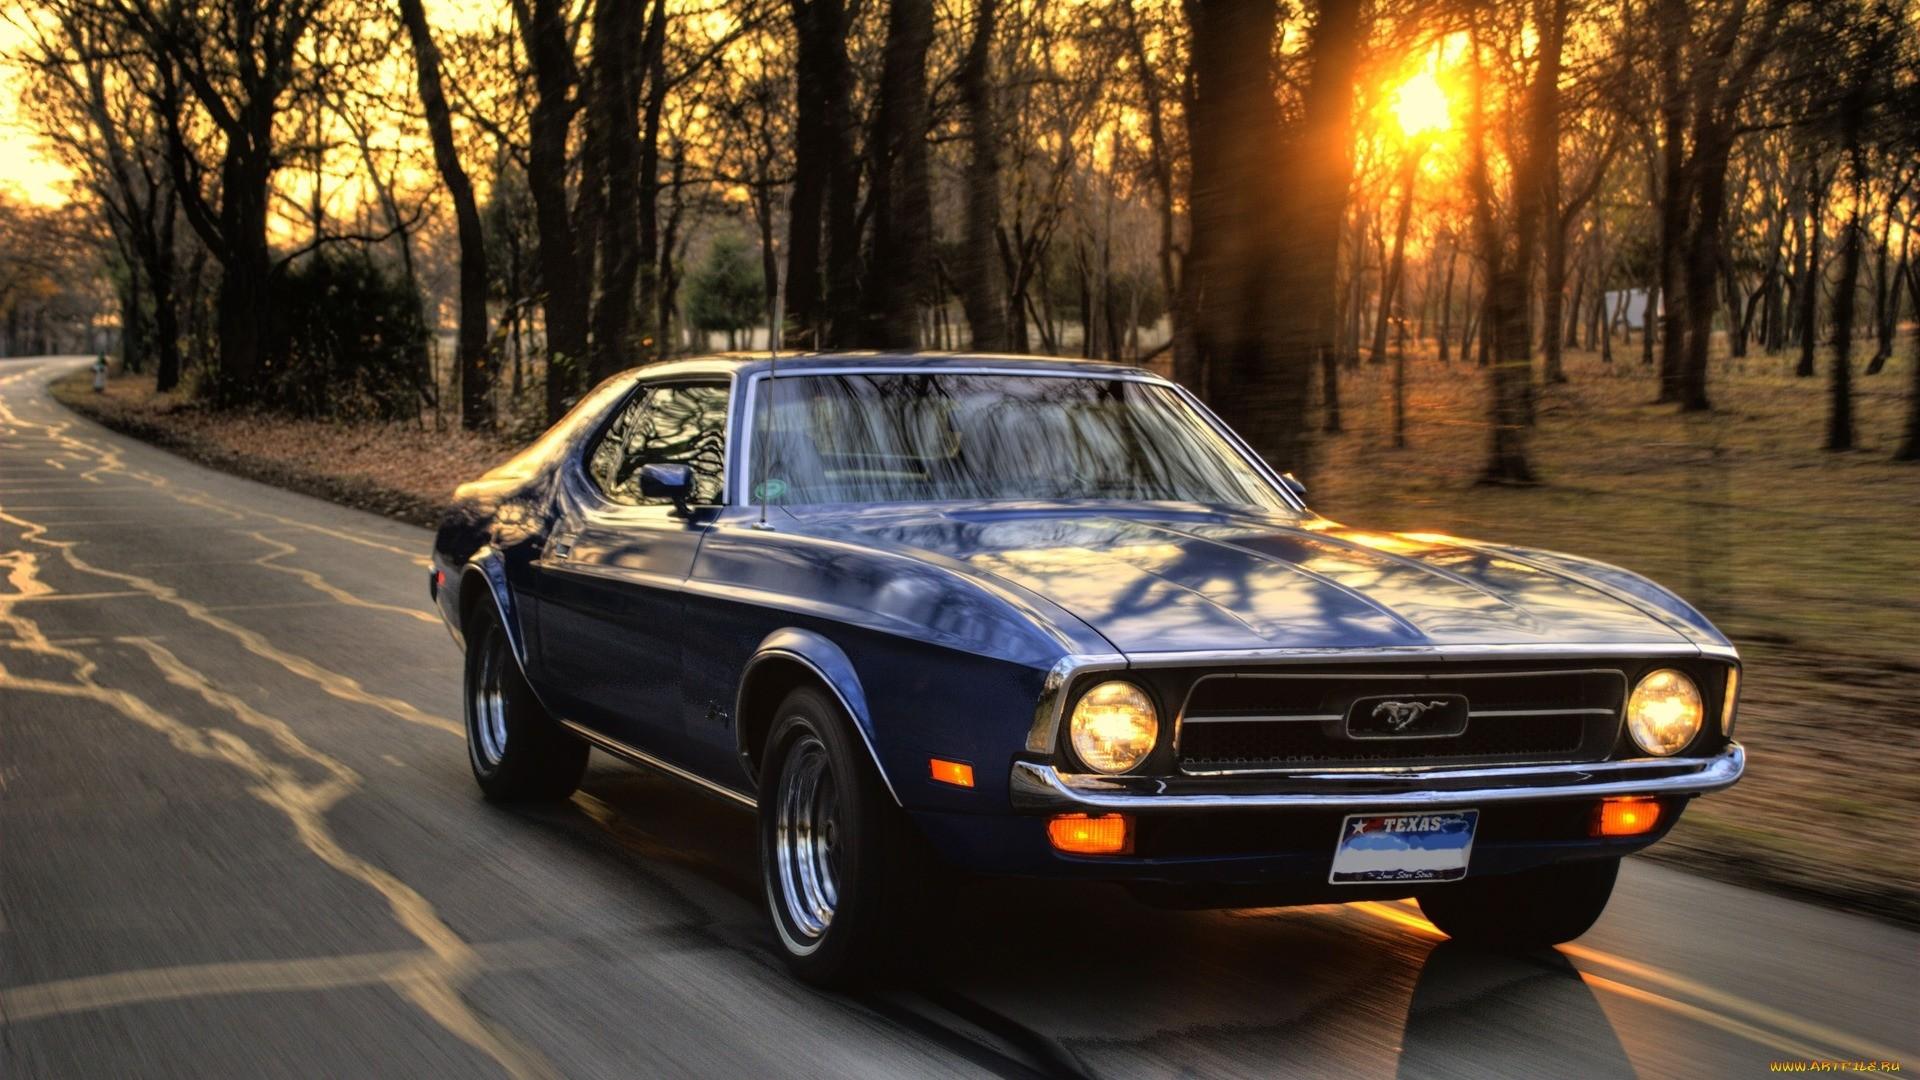 Mustang Wallpaper Pic